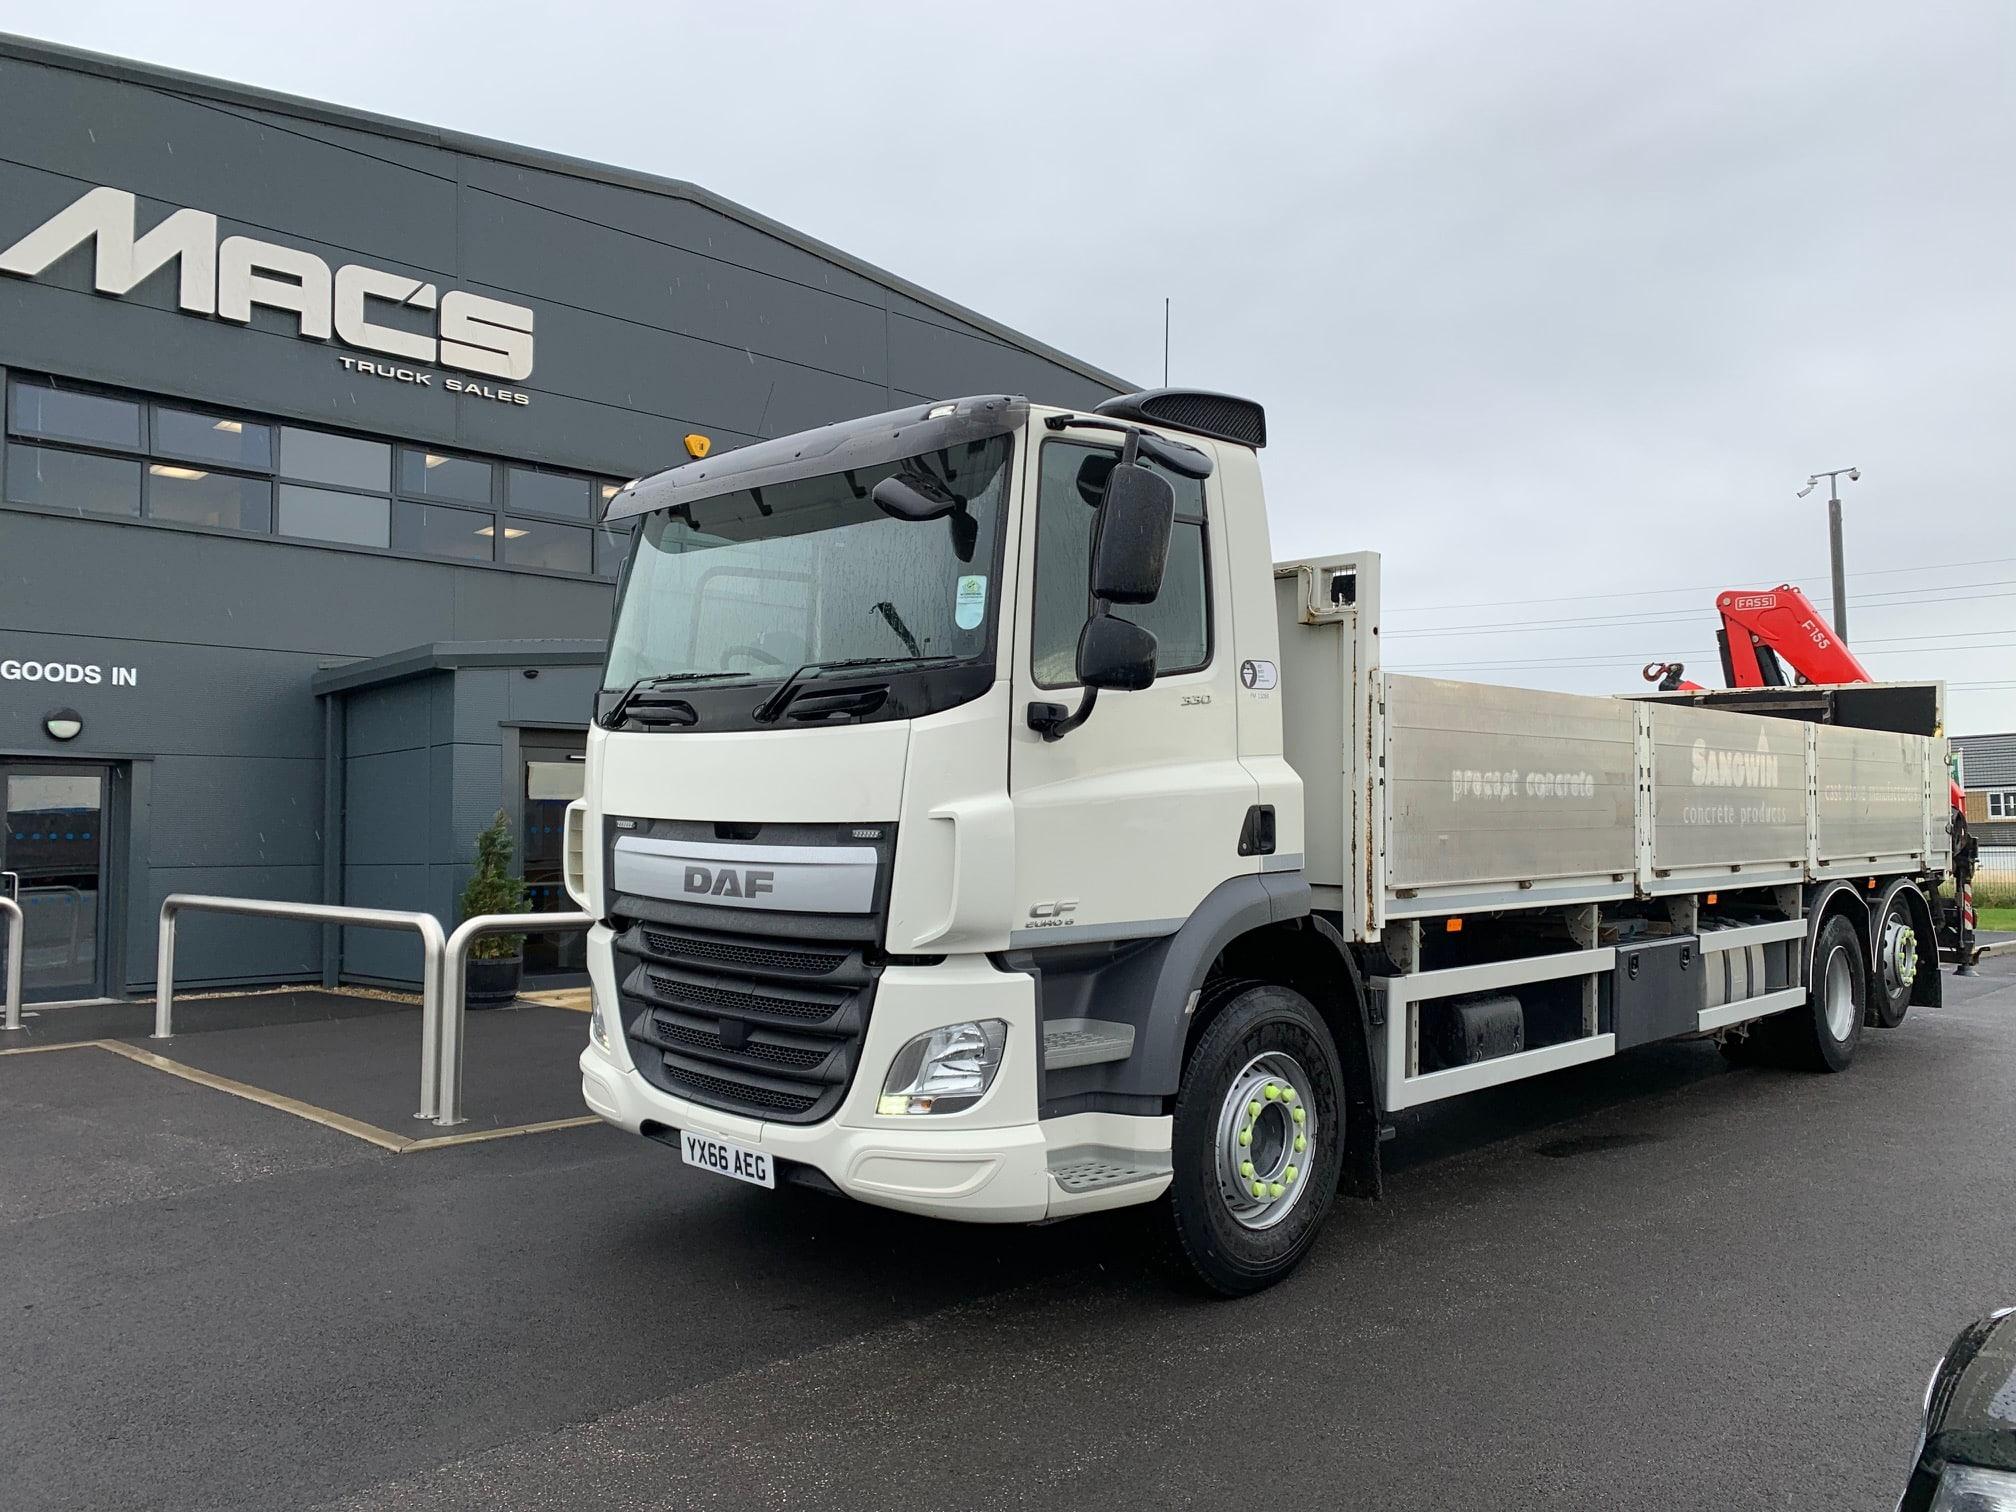 Mac's Trucks in Huddersfield – Buy New & Used Trucks